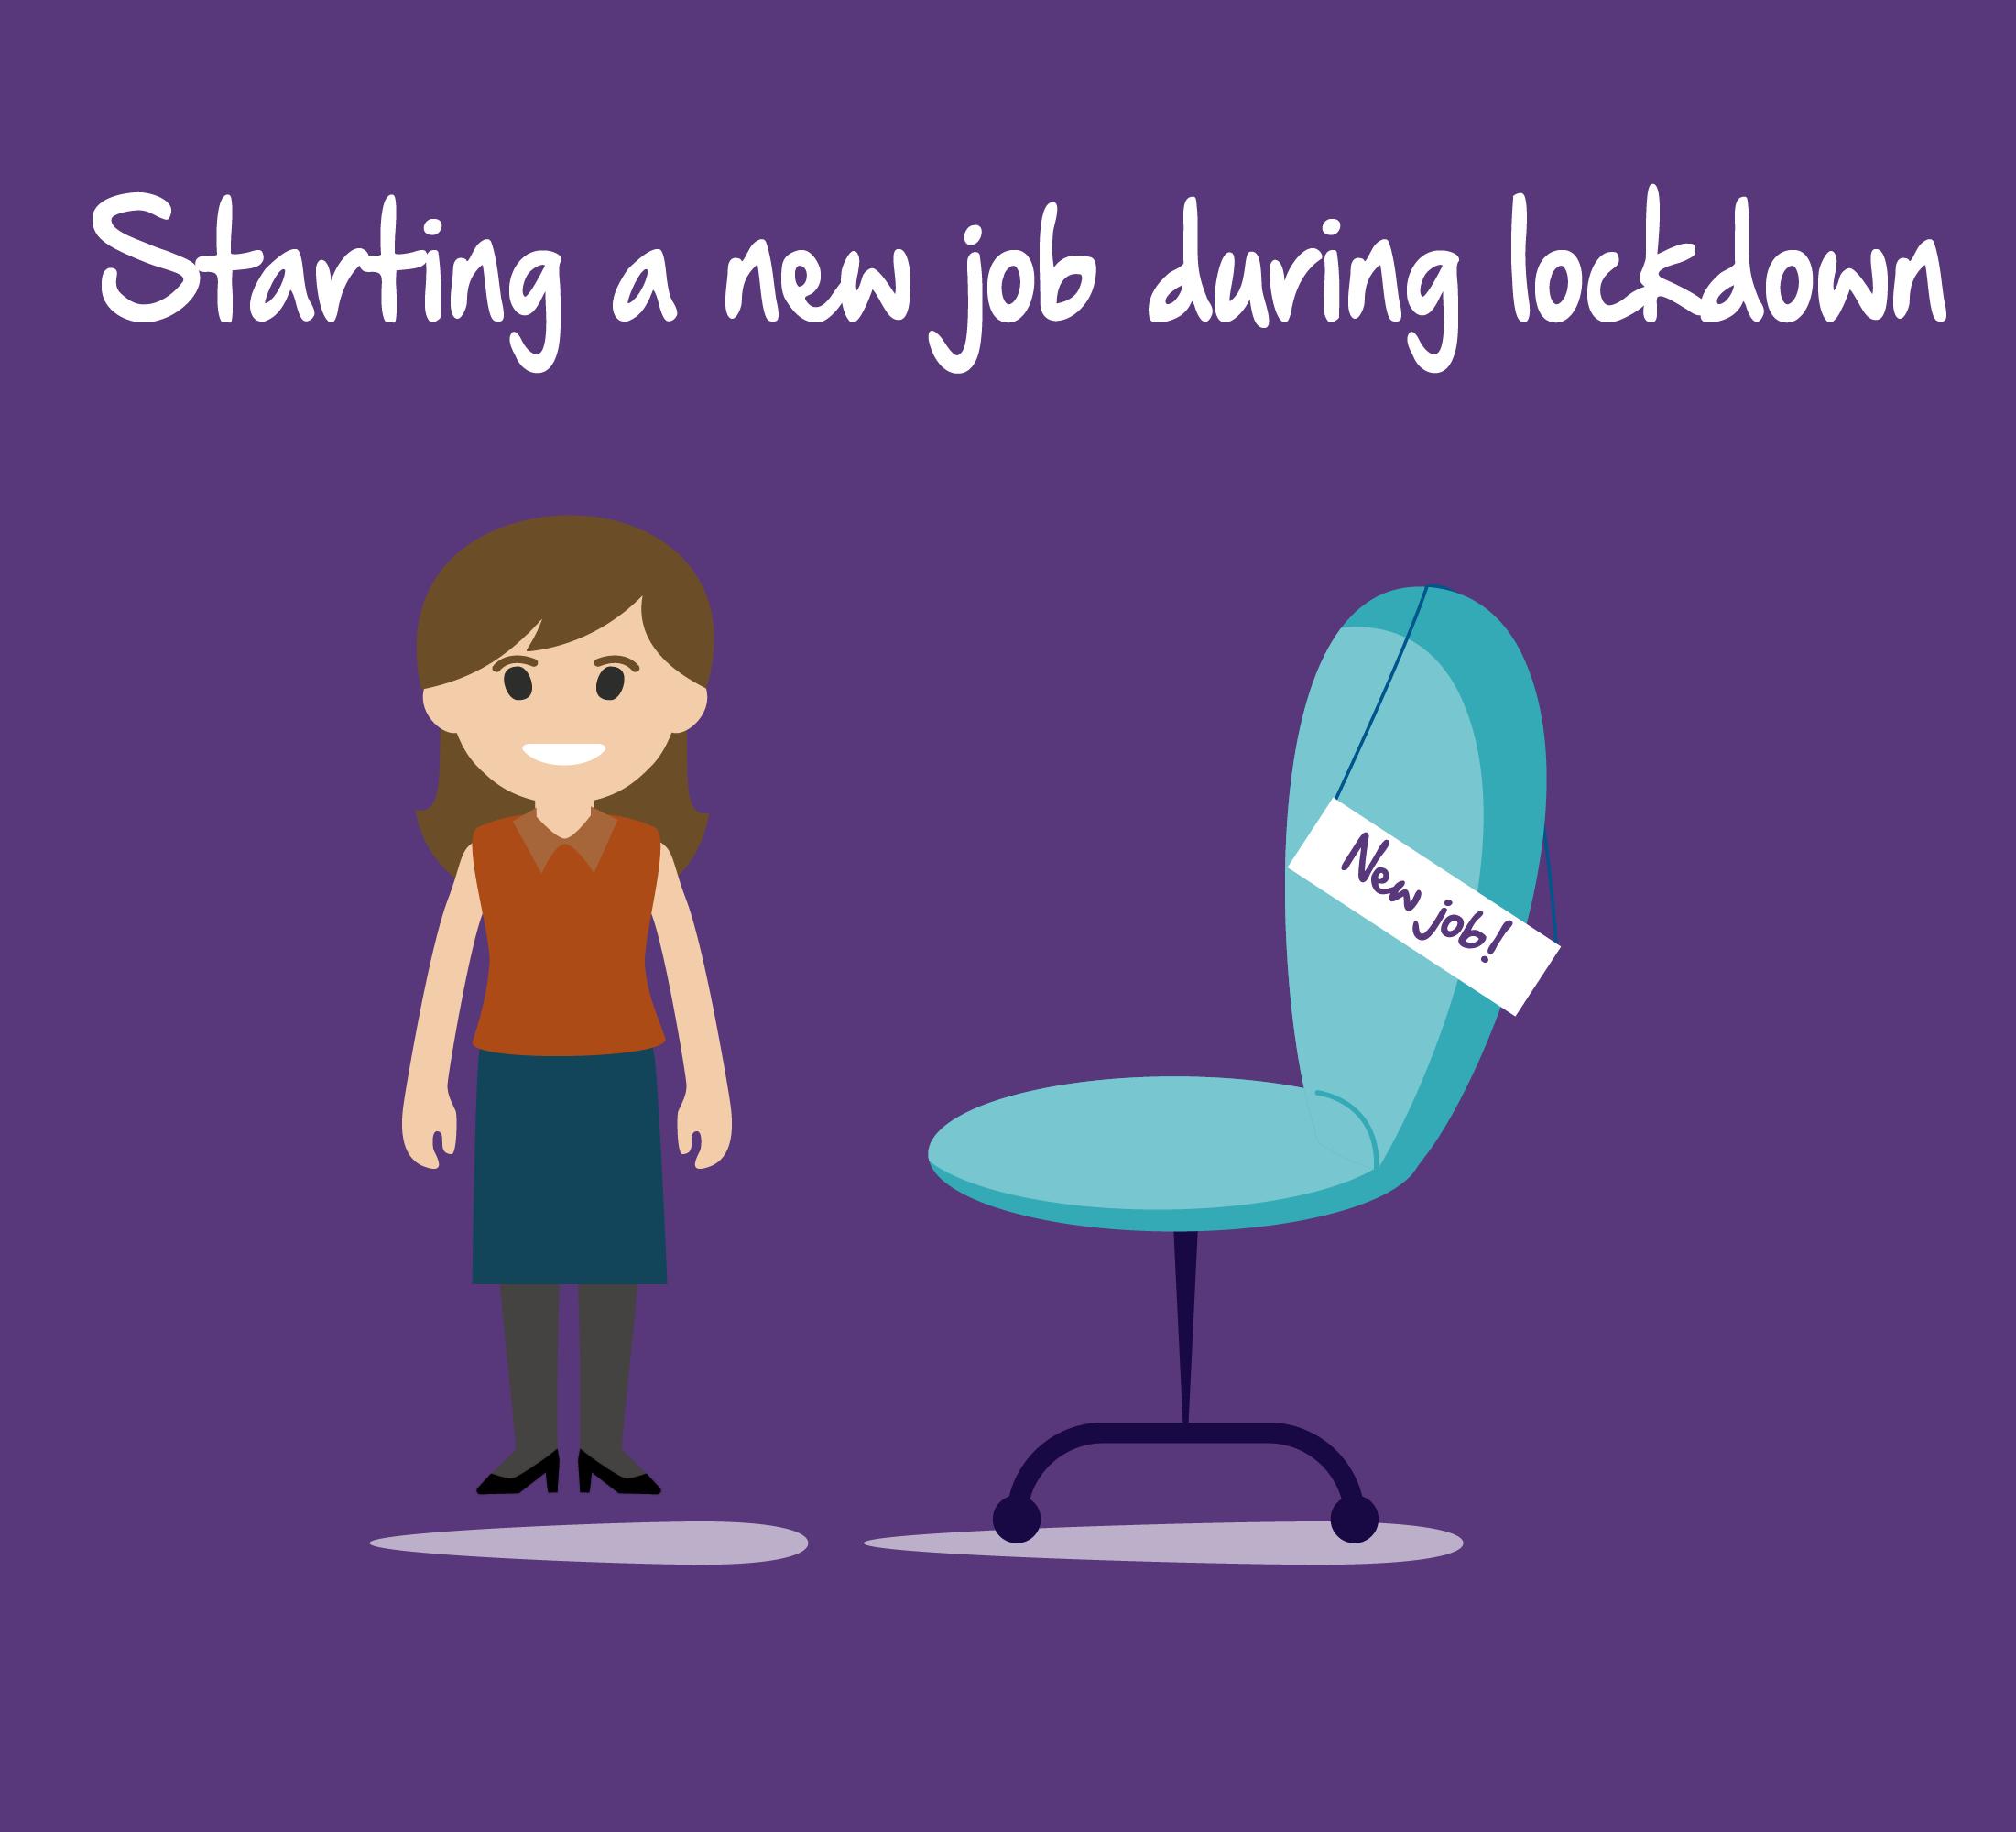 Starting a new job during lockdown